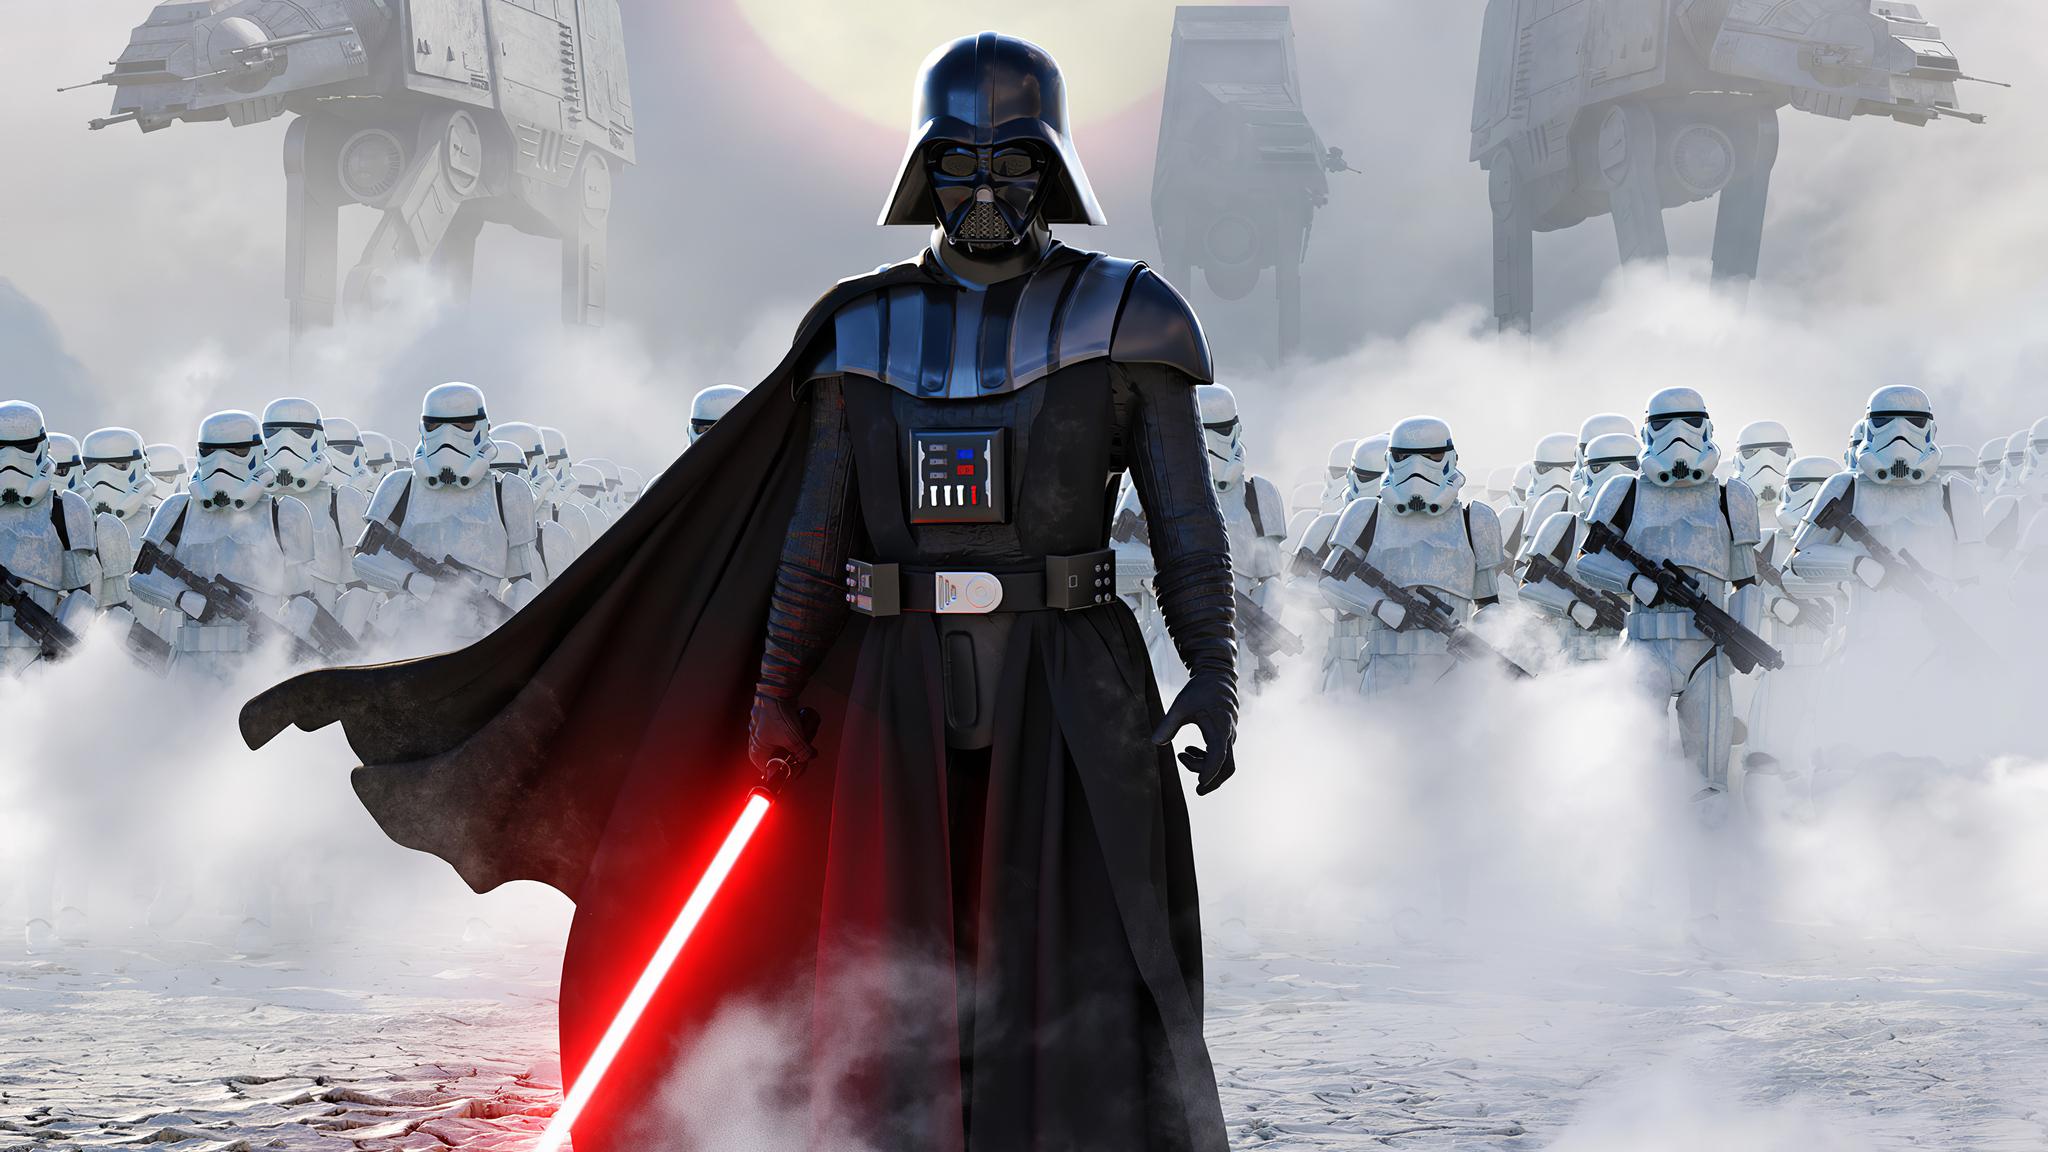 star-wars-imperial-march-4k-ss.jpg